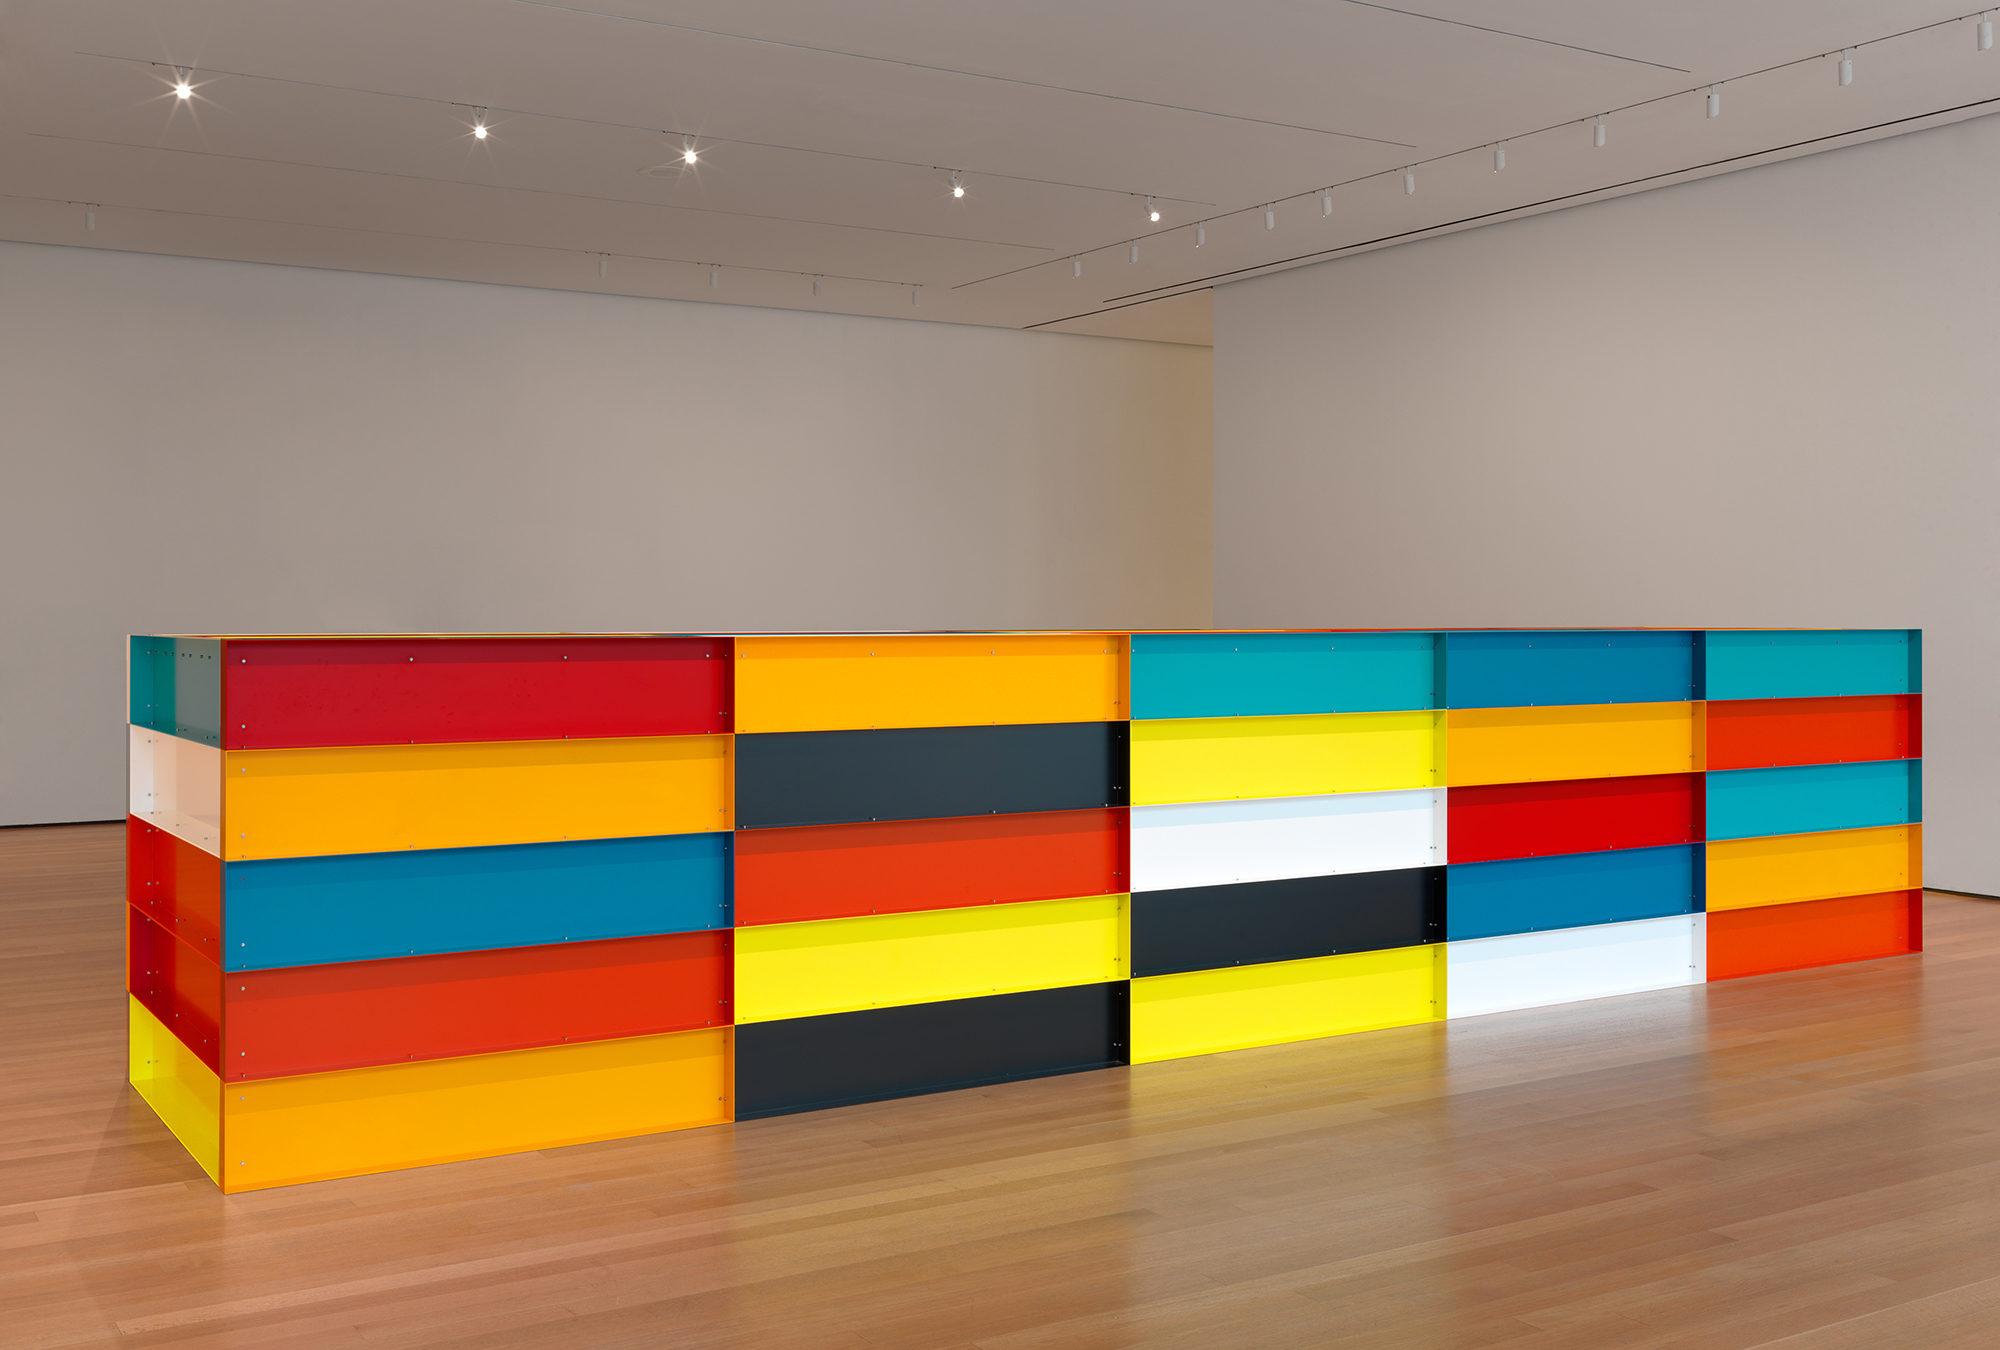 Major Donald Judd retrospective coming to MoMA in 2020